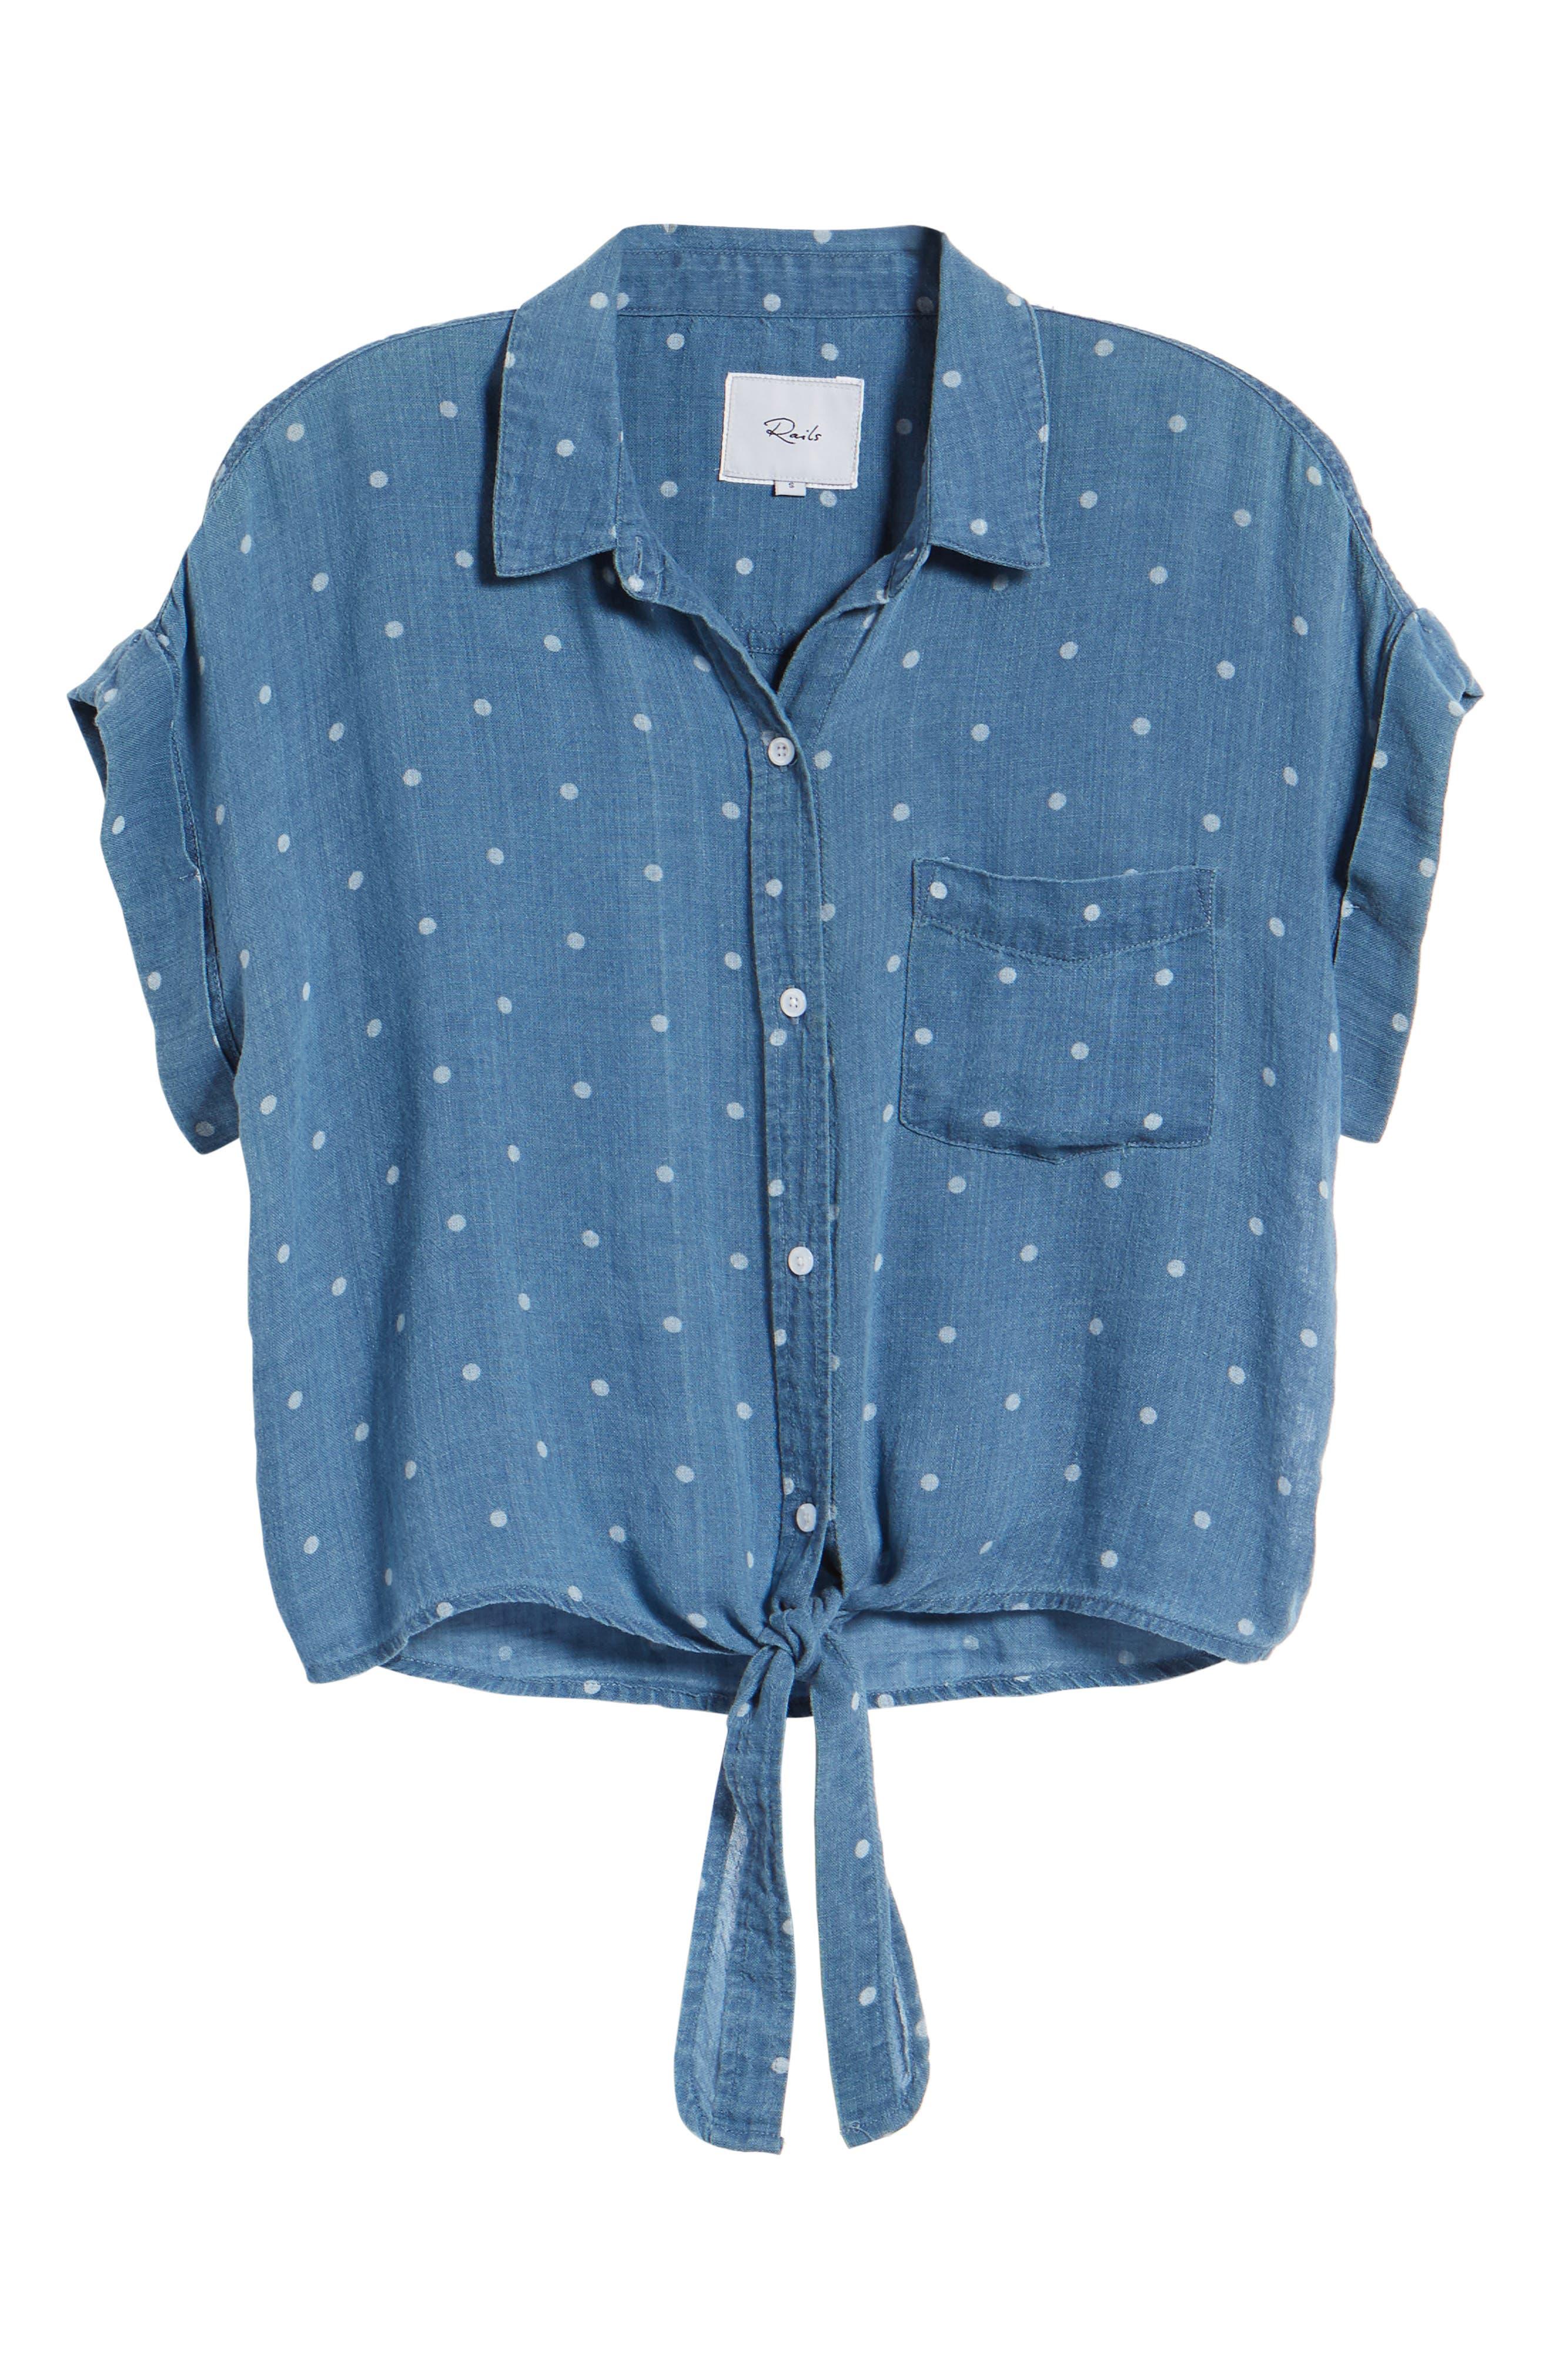 Amelie Tie Front Shirt,                             Alternate thumbnail 7, color,                             INDIGO WHITE POLKA DOTS